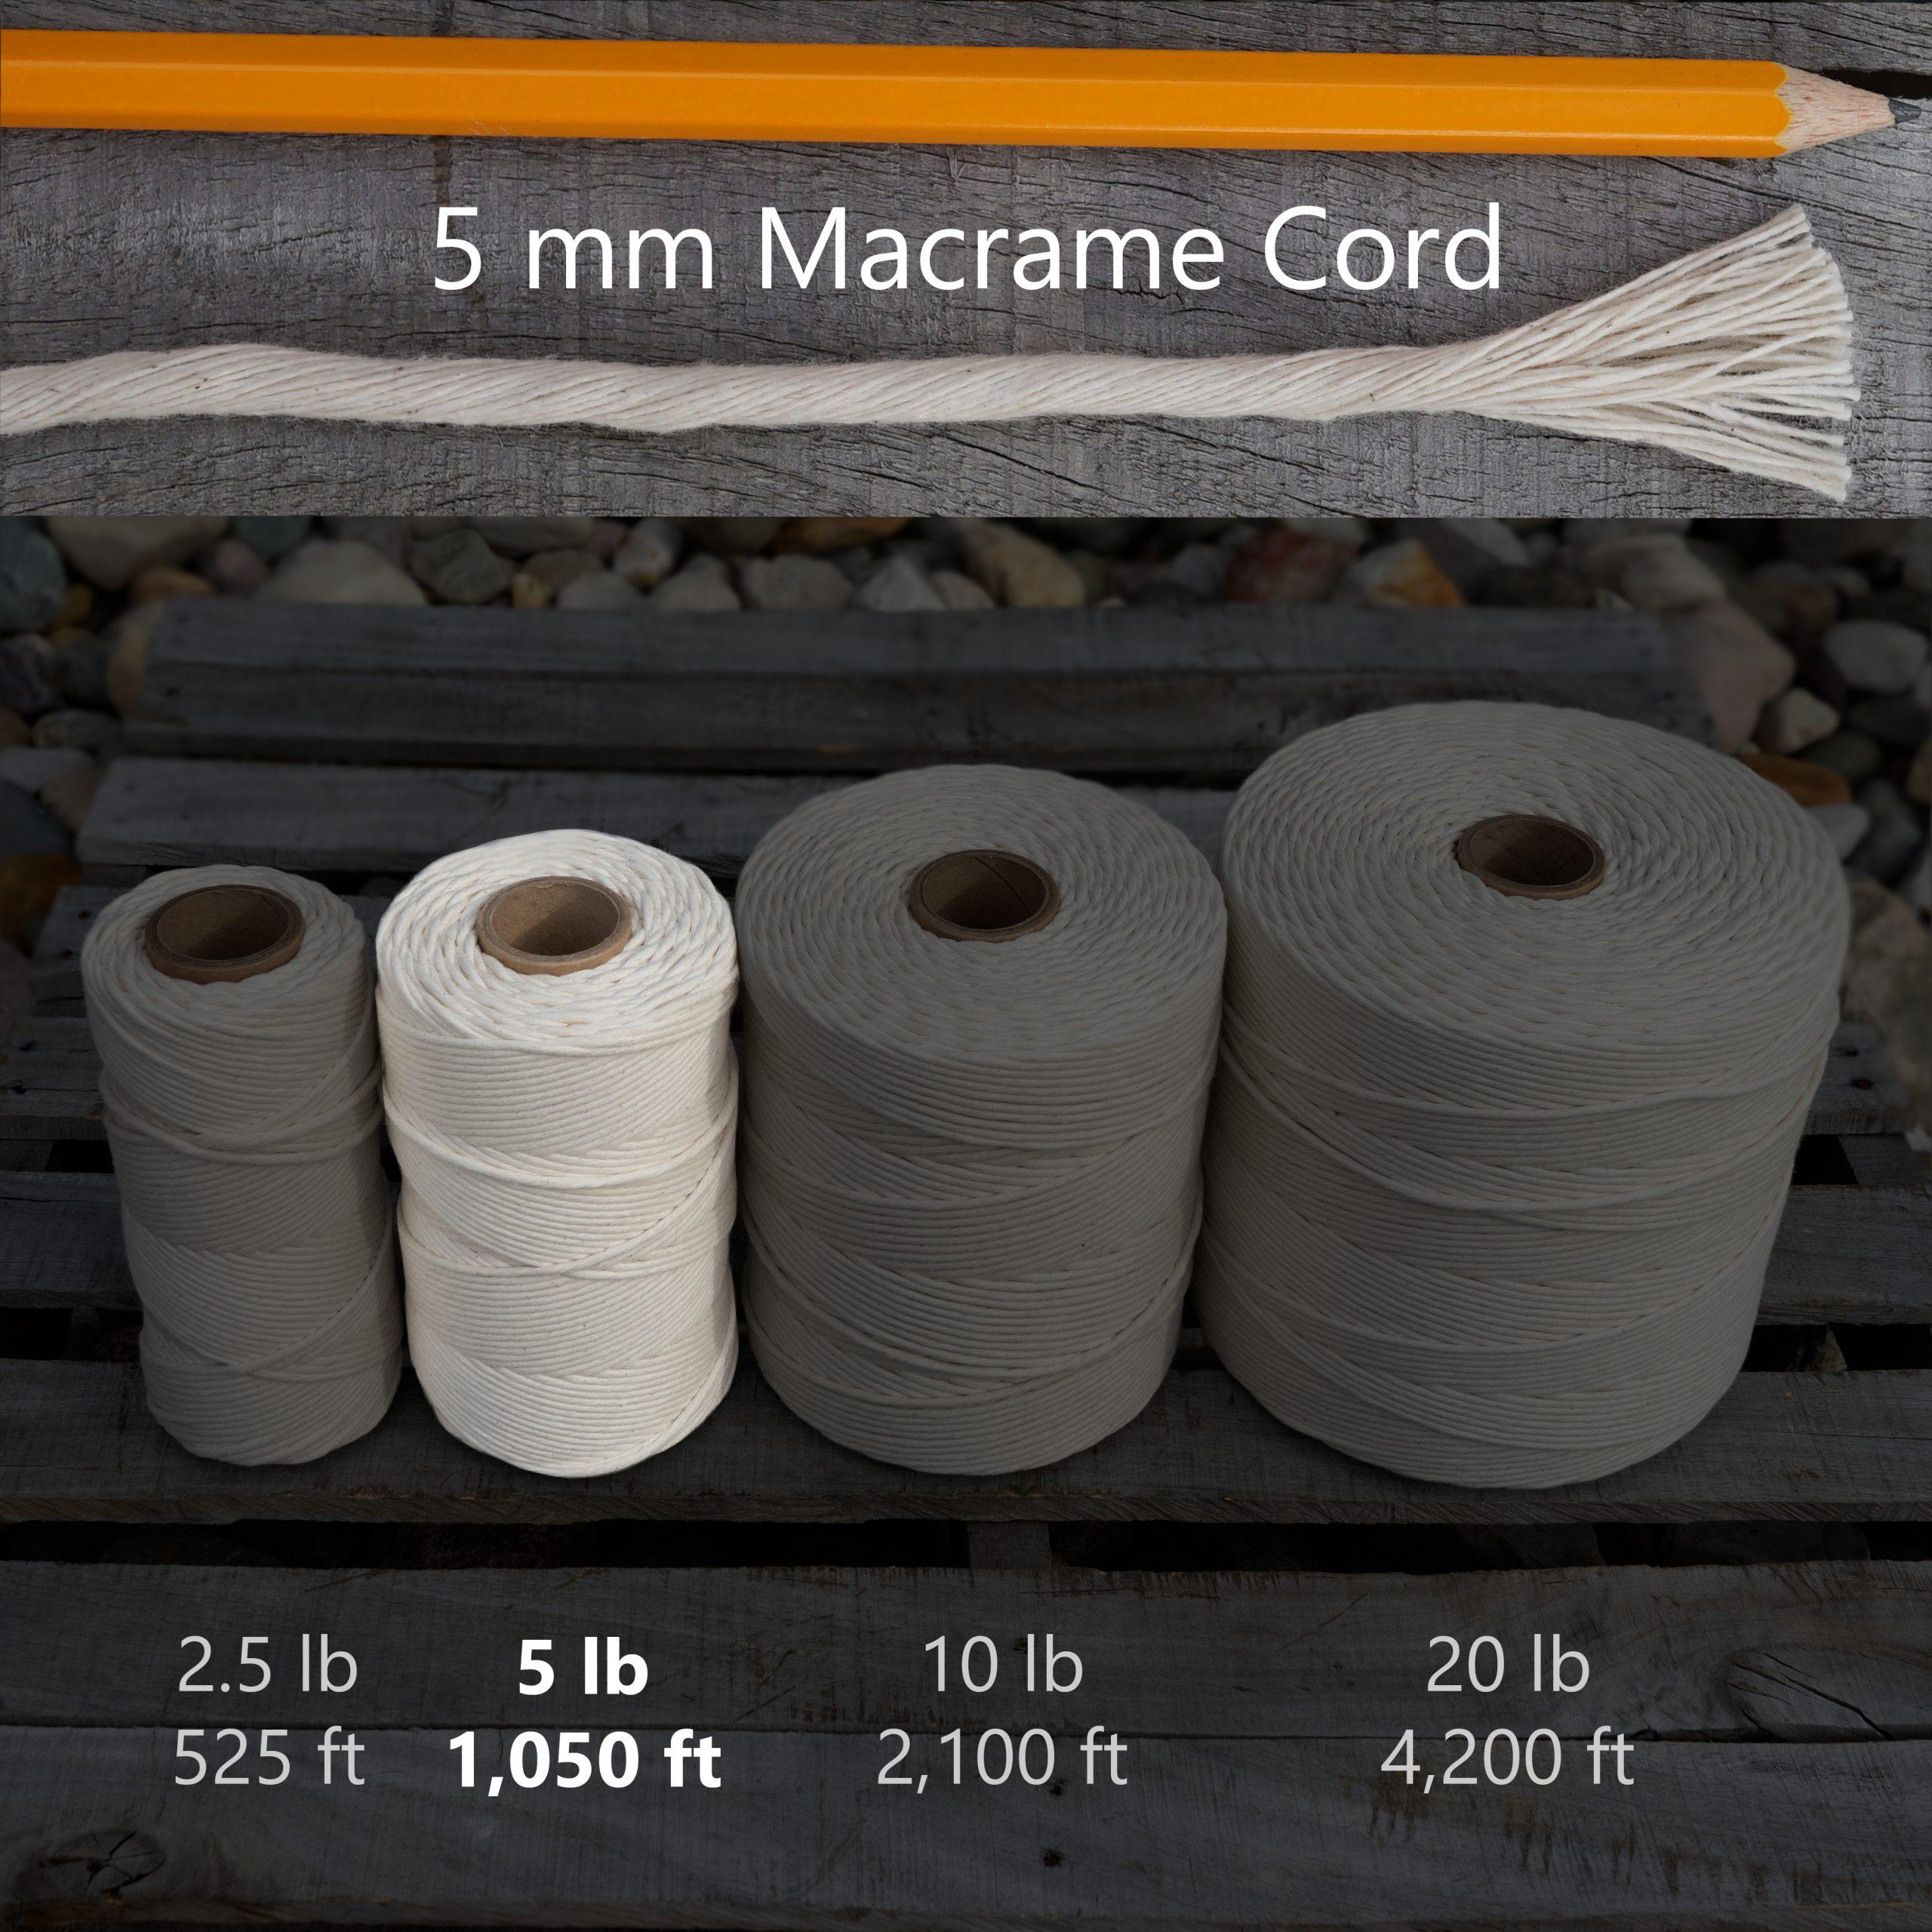 5 mm x 5 lb macrame tube